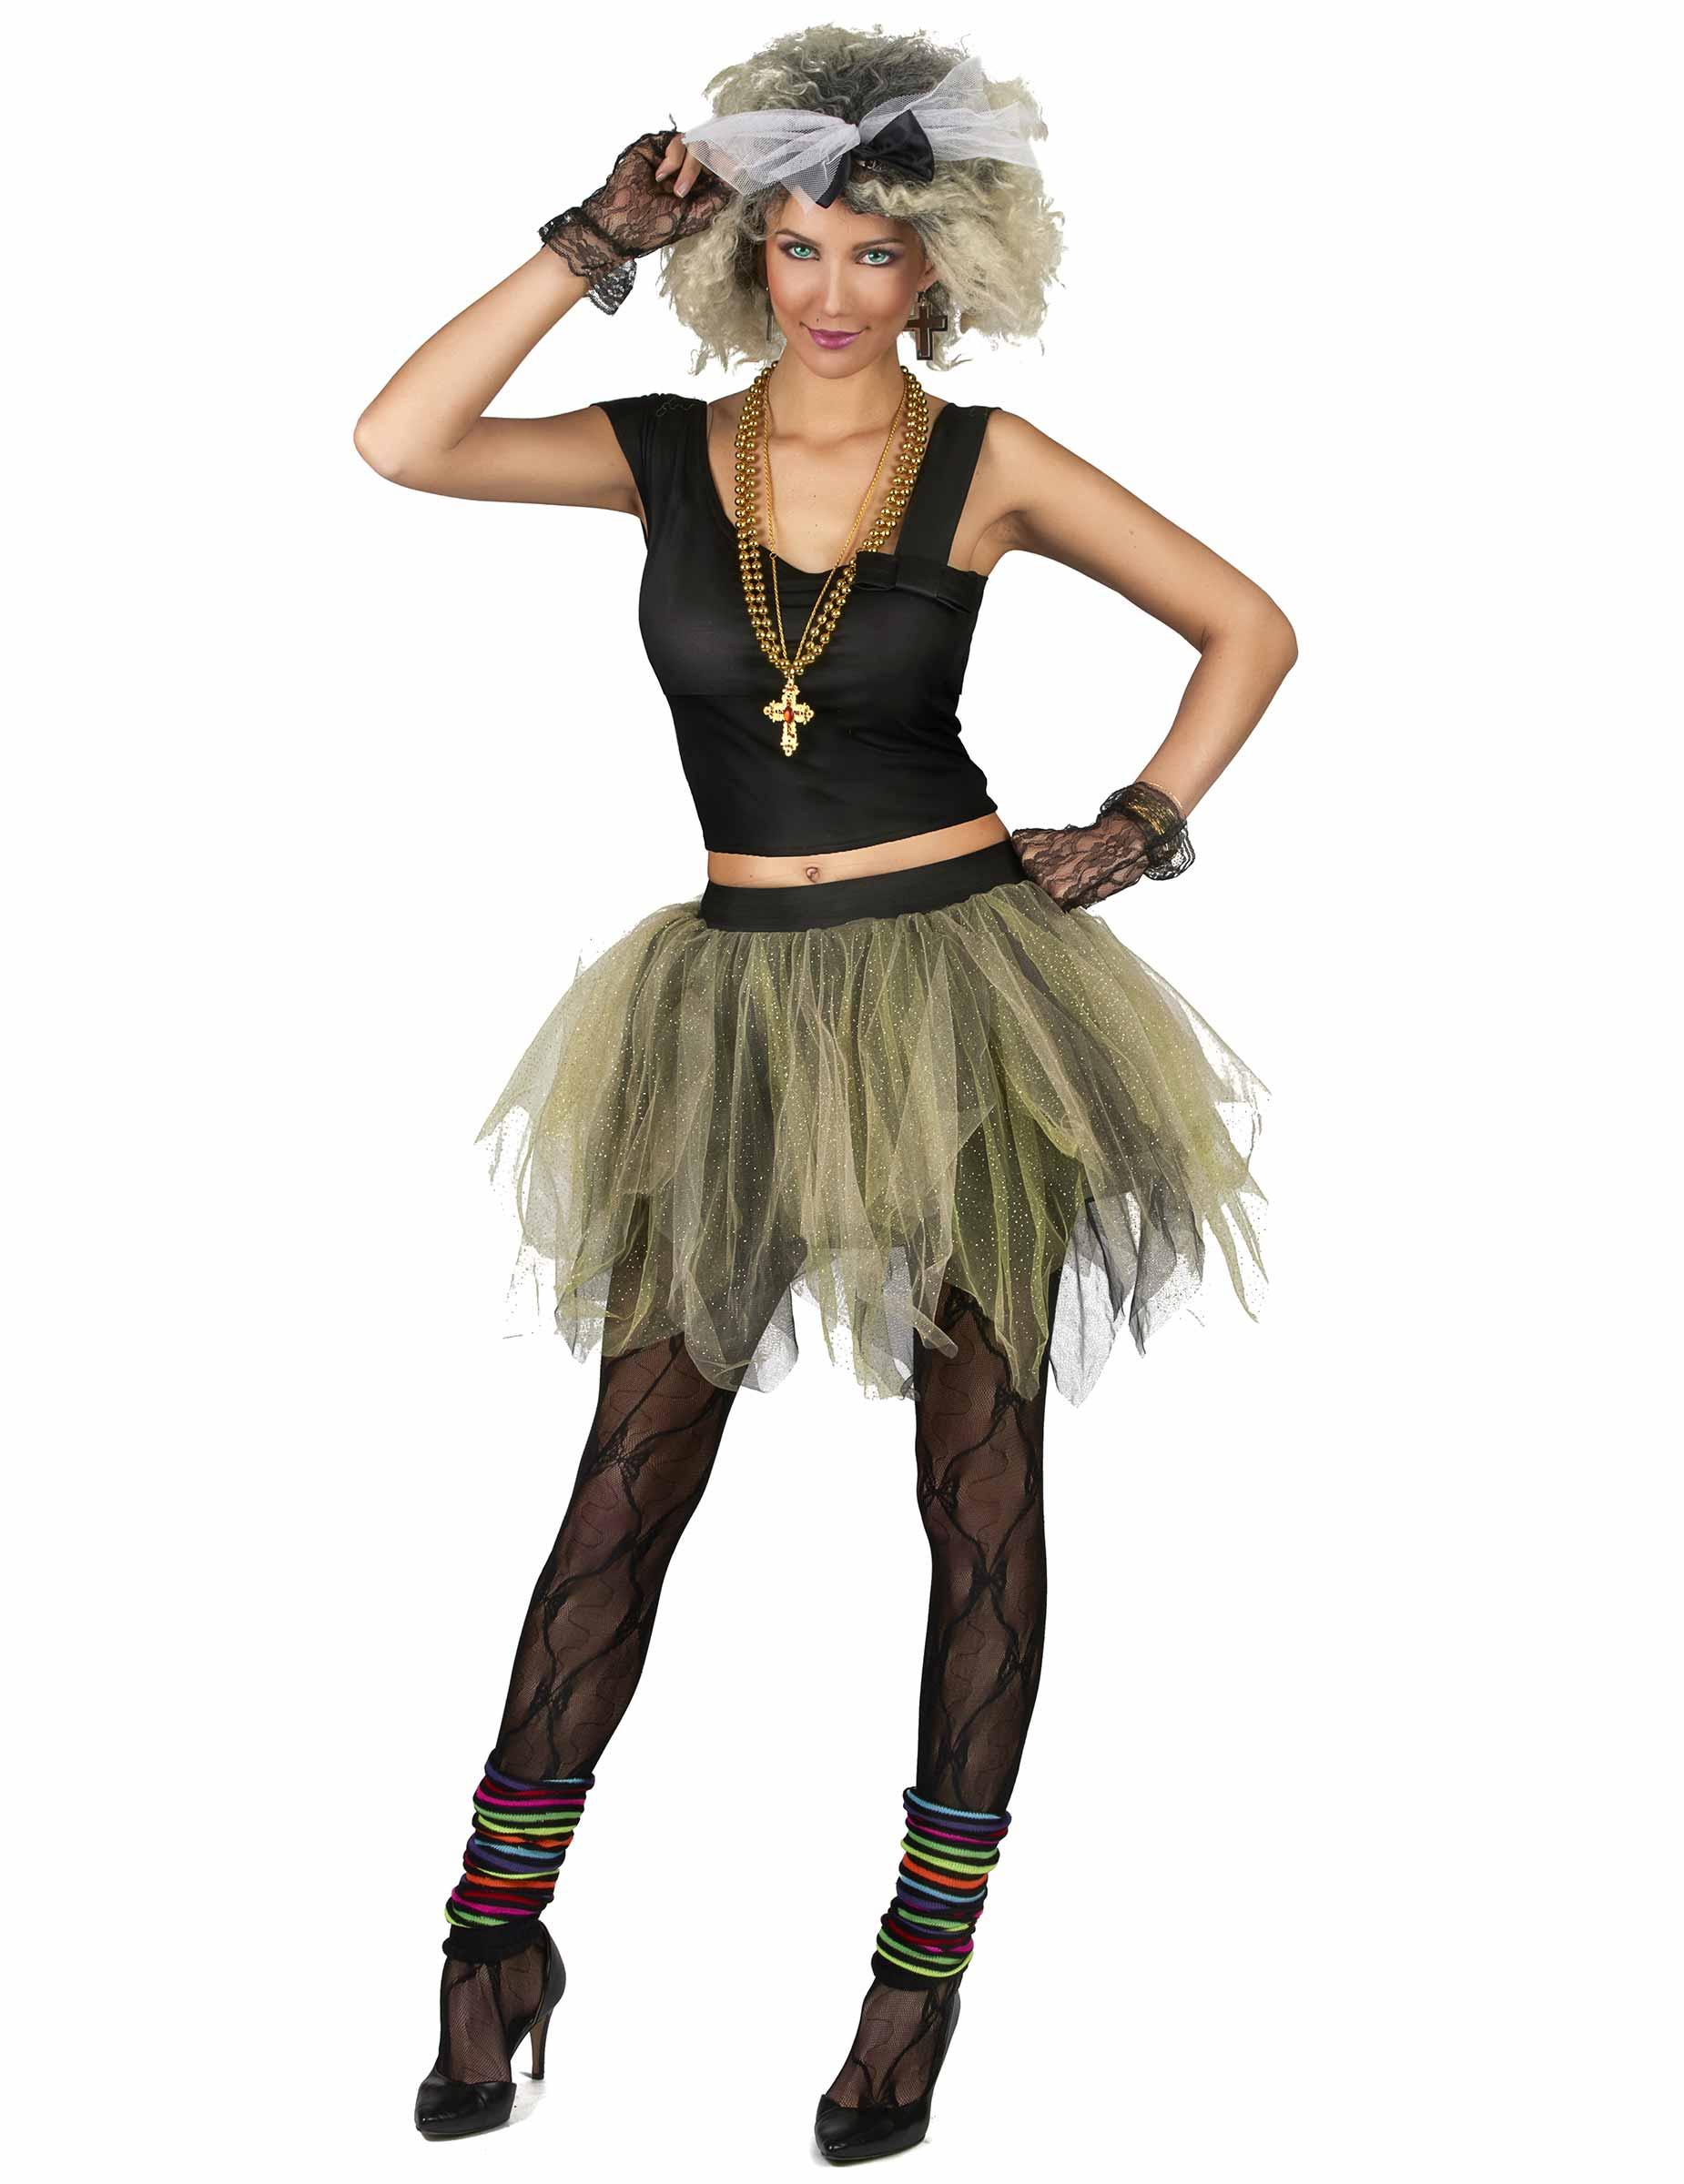 Costume Disco Rock Tutu Anni 80 Donna Costumi Adulti E